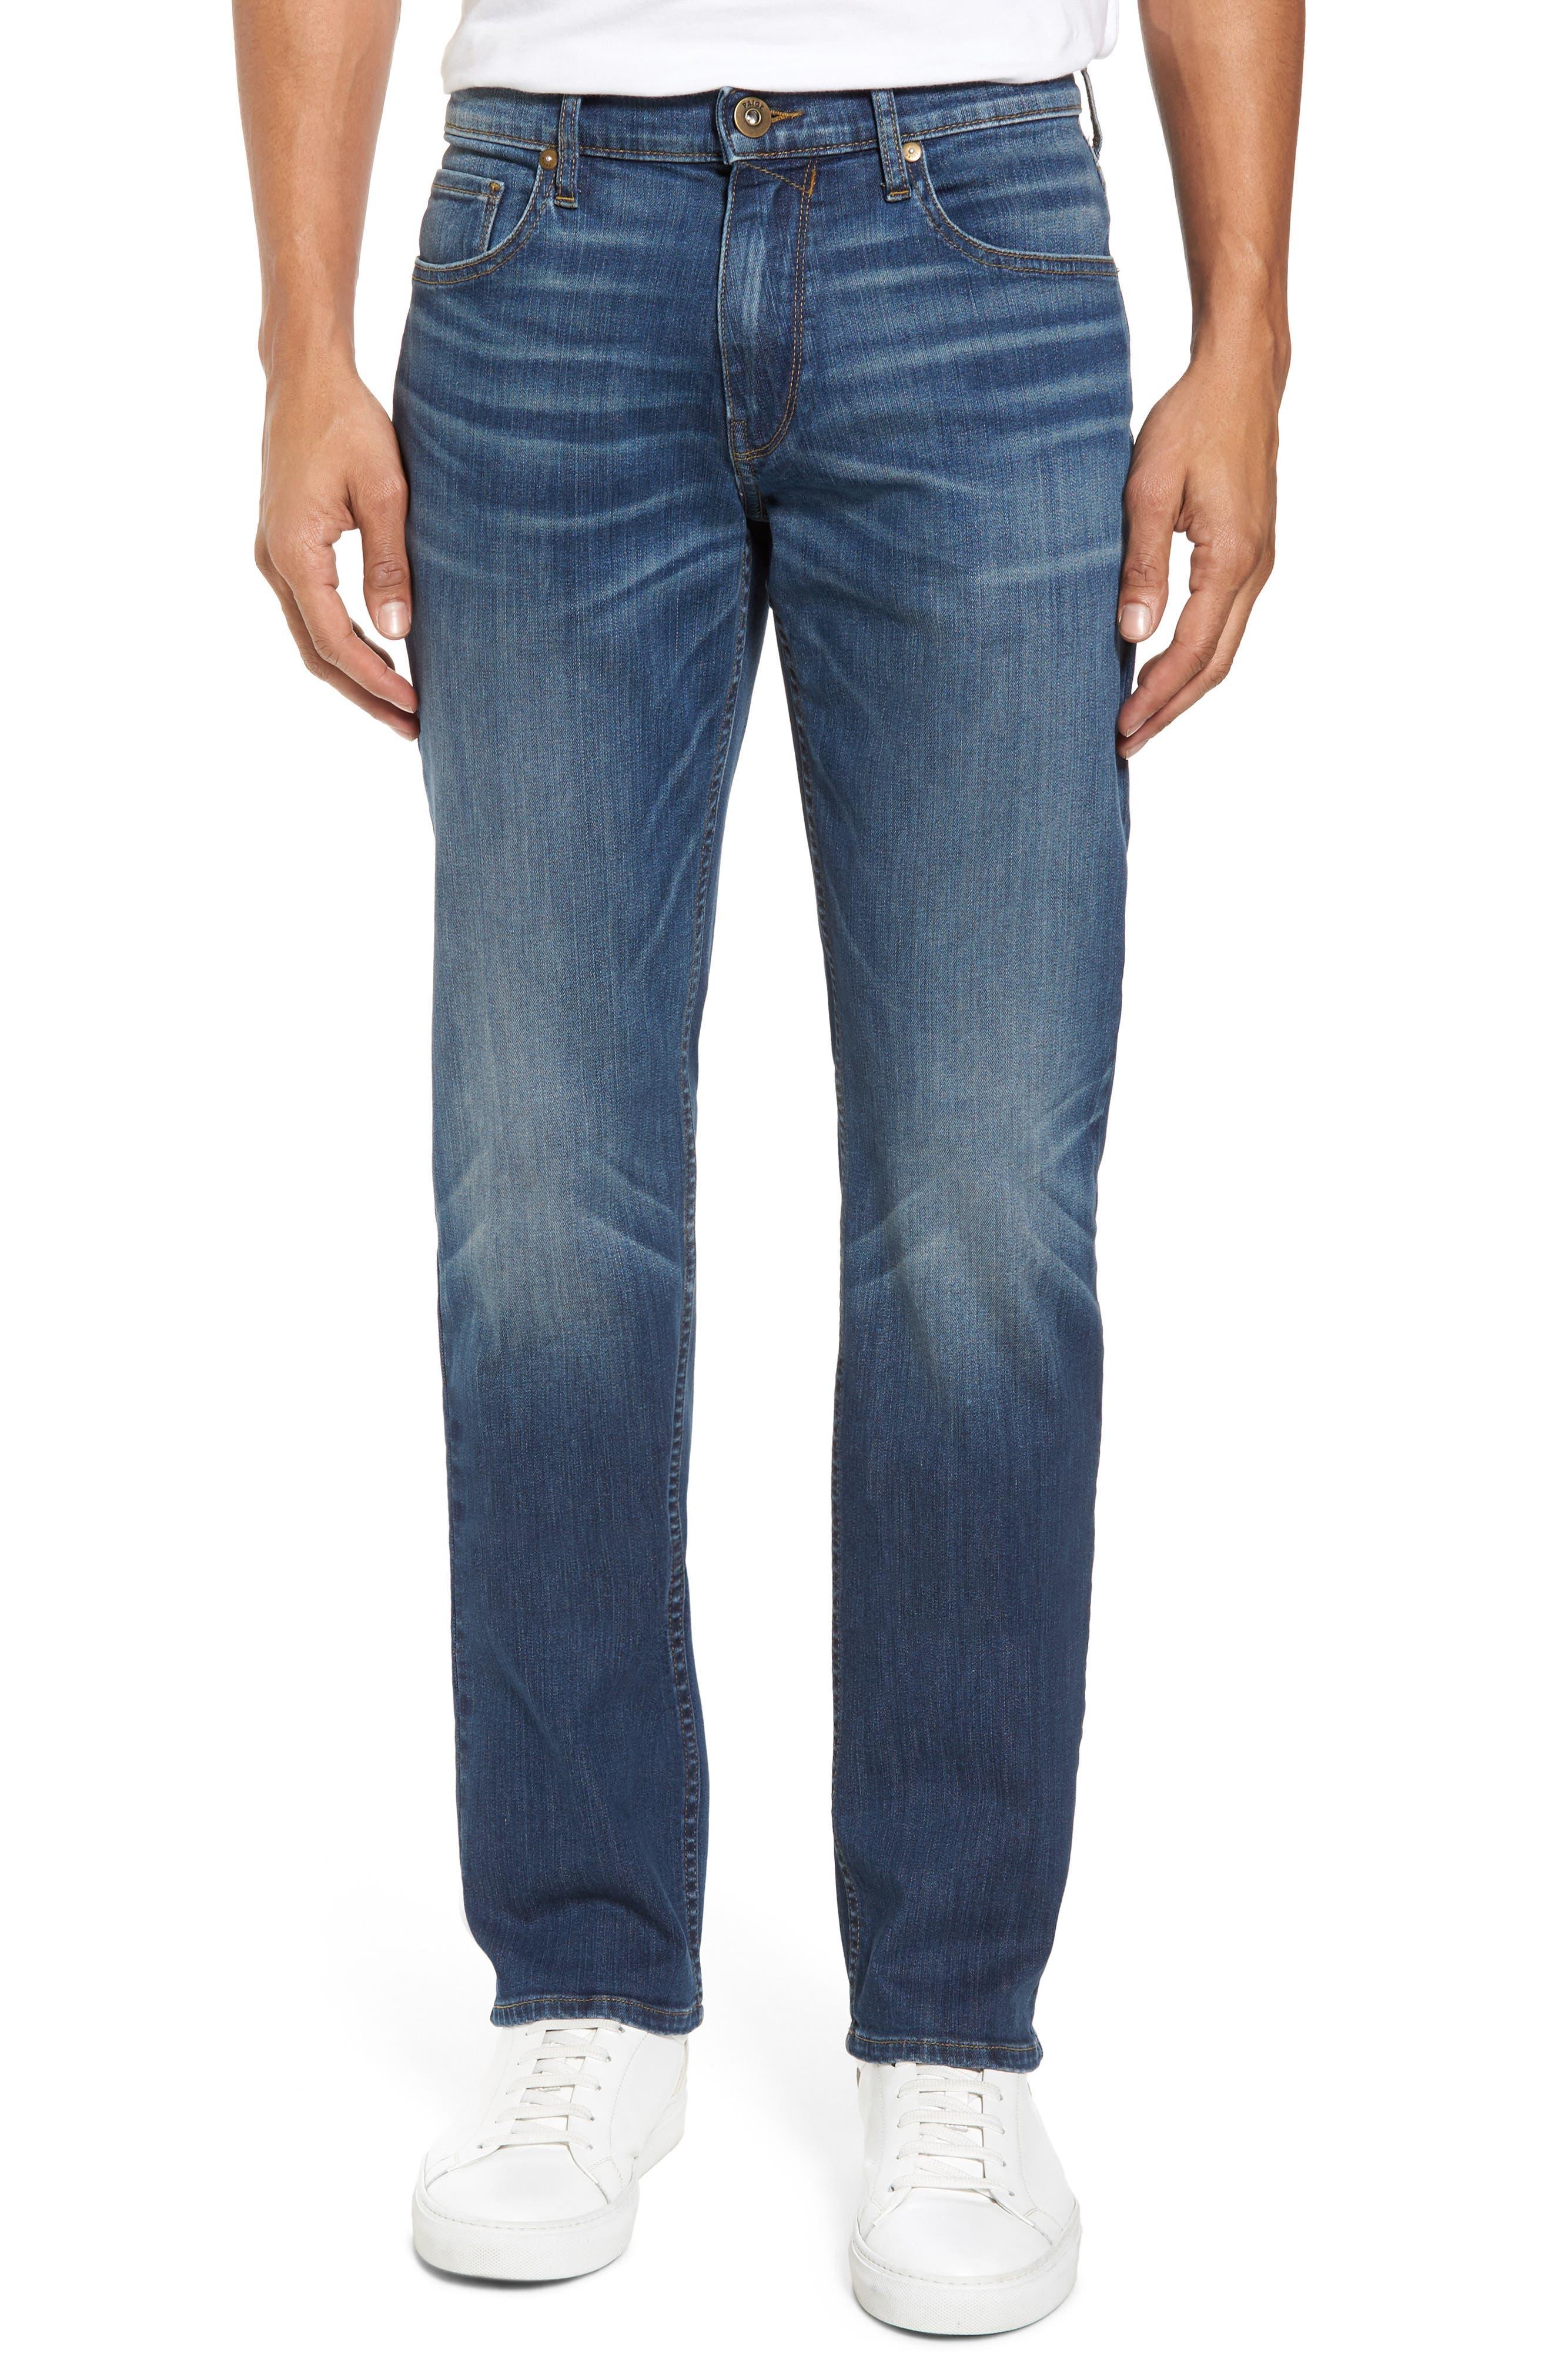 Legacy - Normandie Straight Leg Jeans,                             Main thumbnail 1, color,                             400